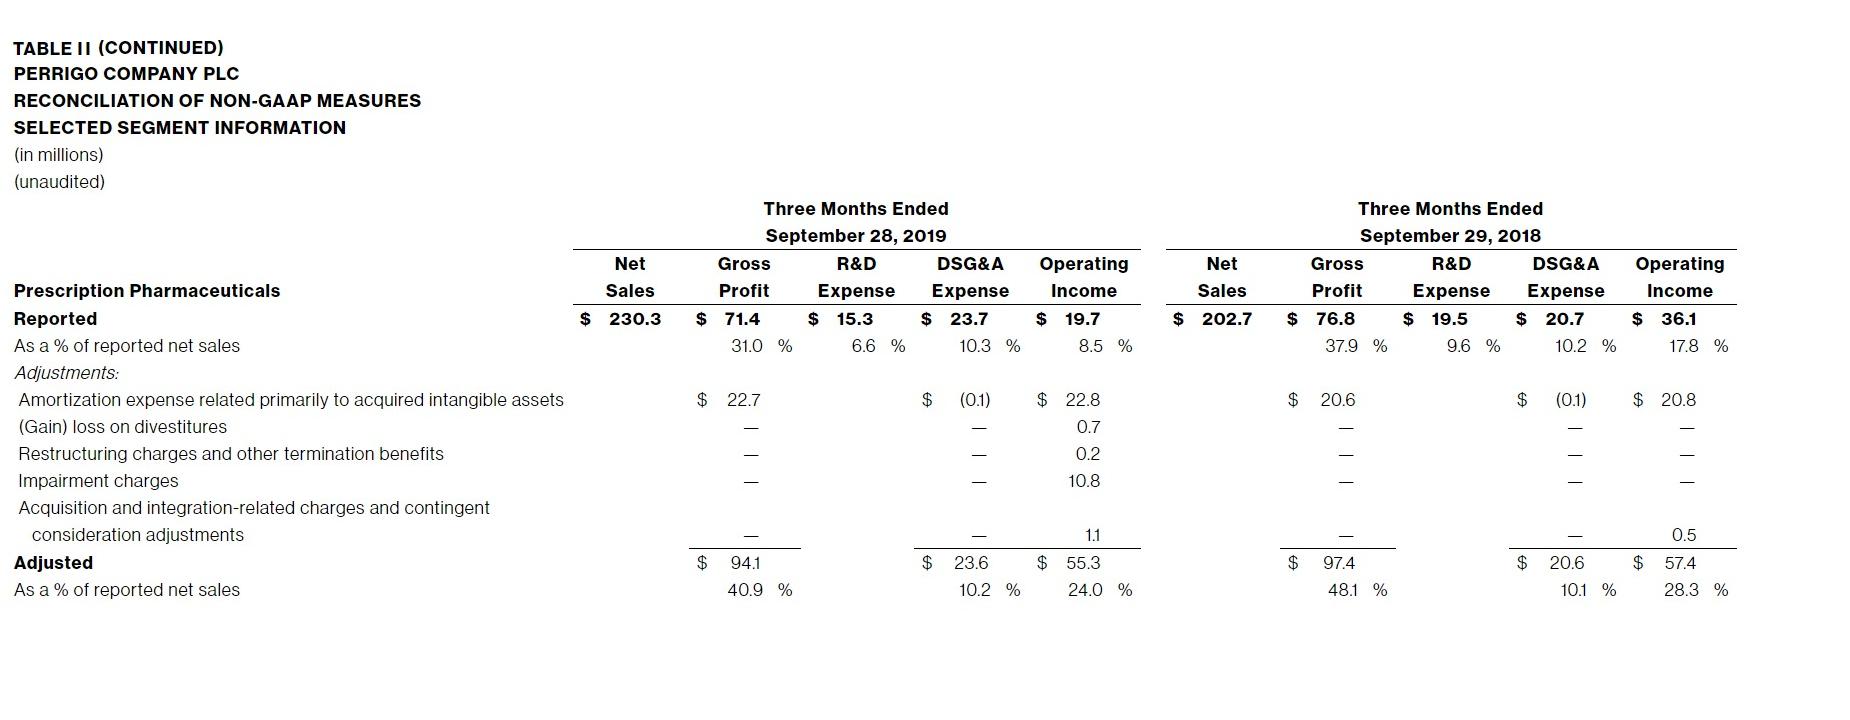 TABLE-II-(CONTINUED)-PERRIGO-COMPANY-PLC-RECONCILIATION-OF-NON-GAAP-MEASURES-SELECTED-SEGMENT-INFORMATION-3